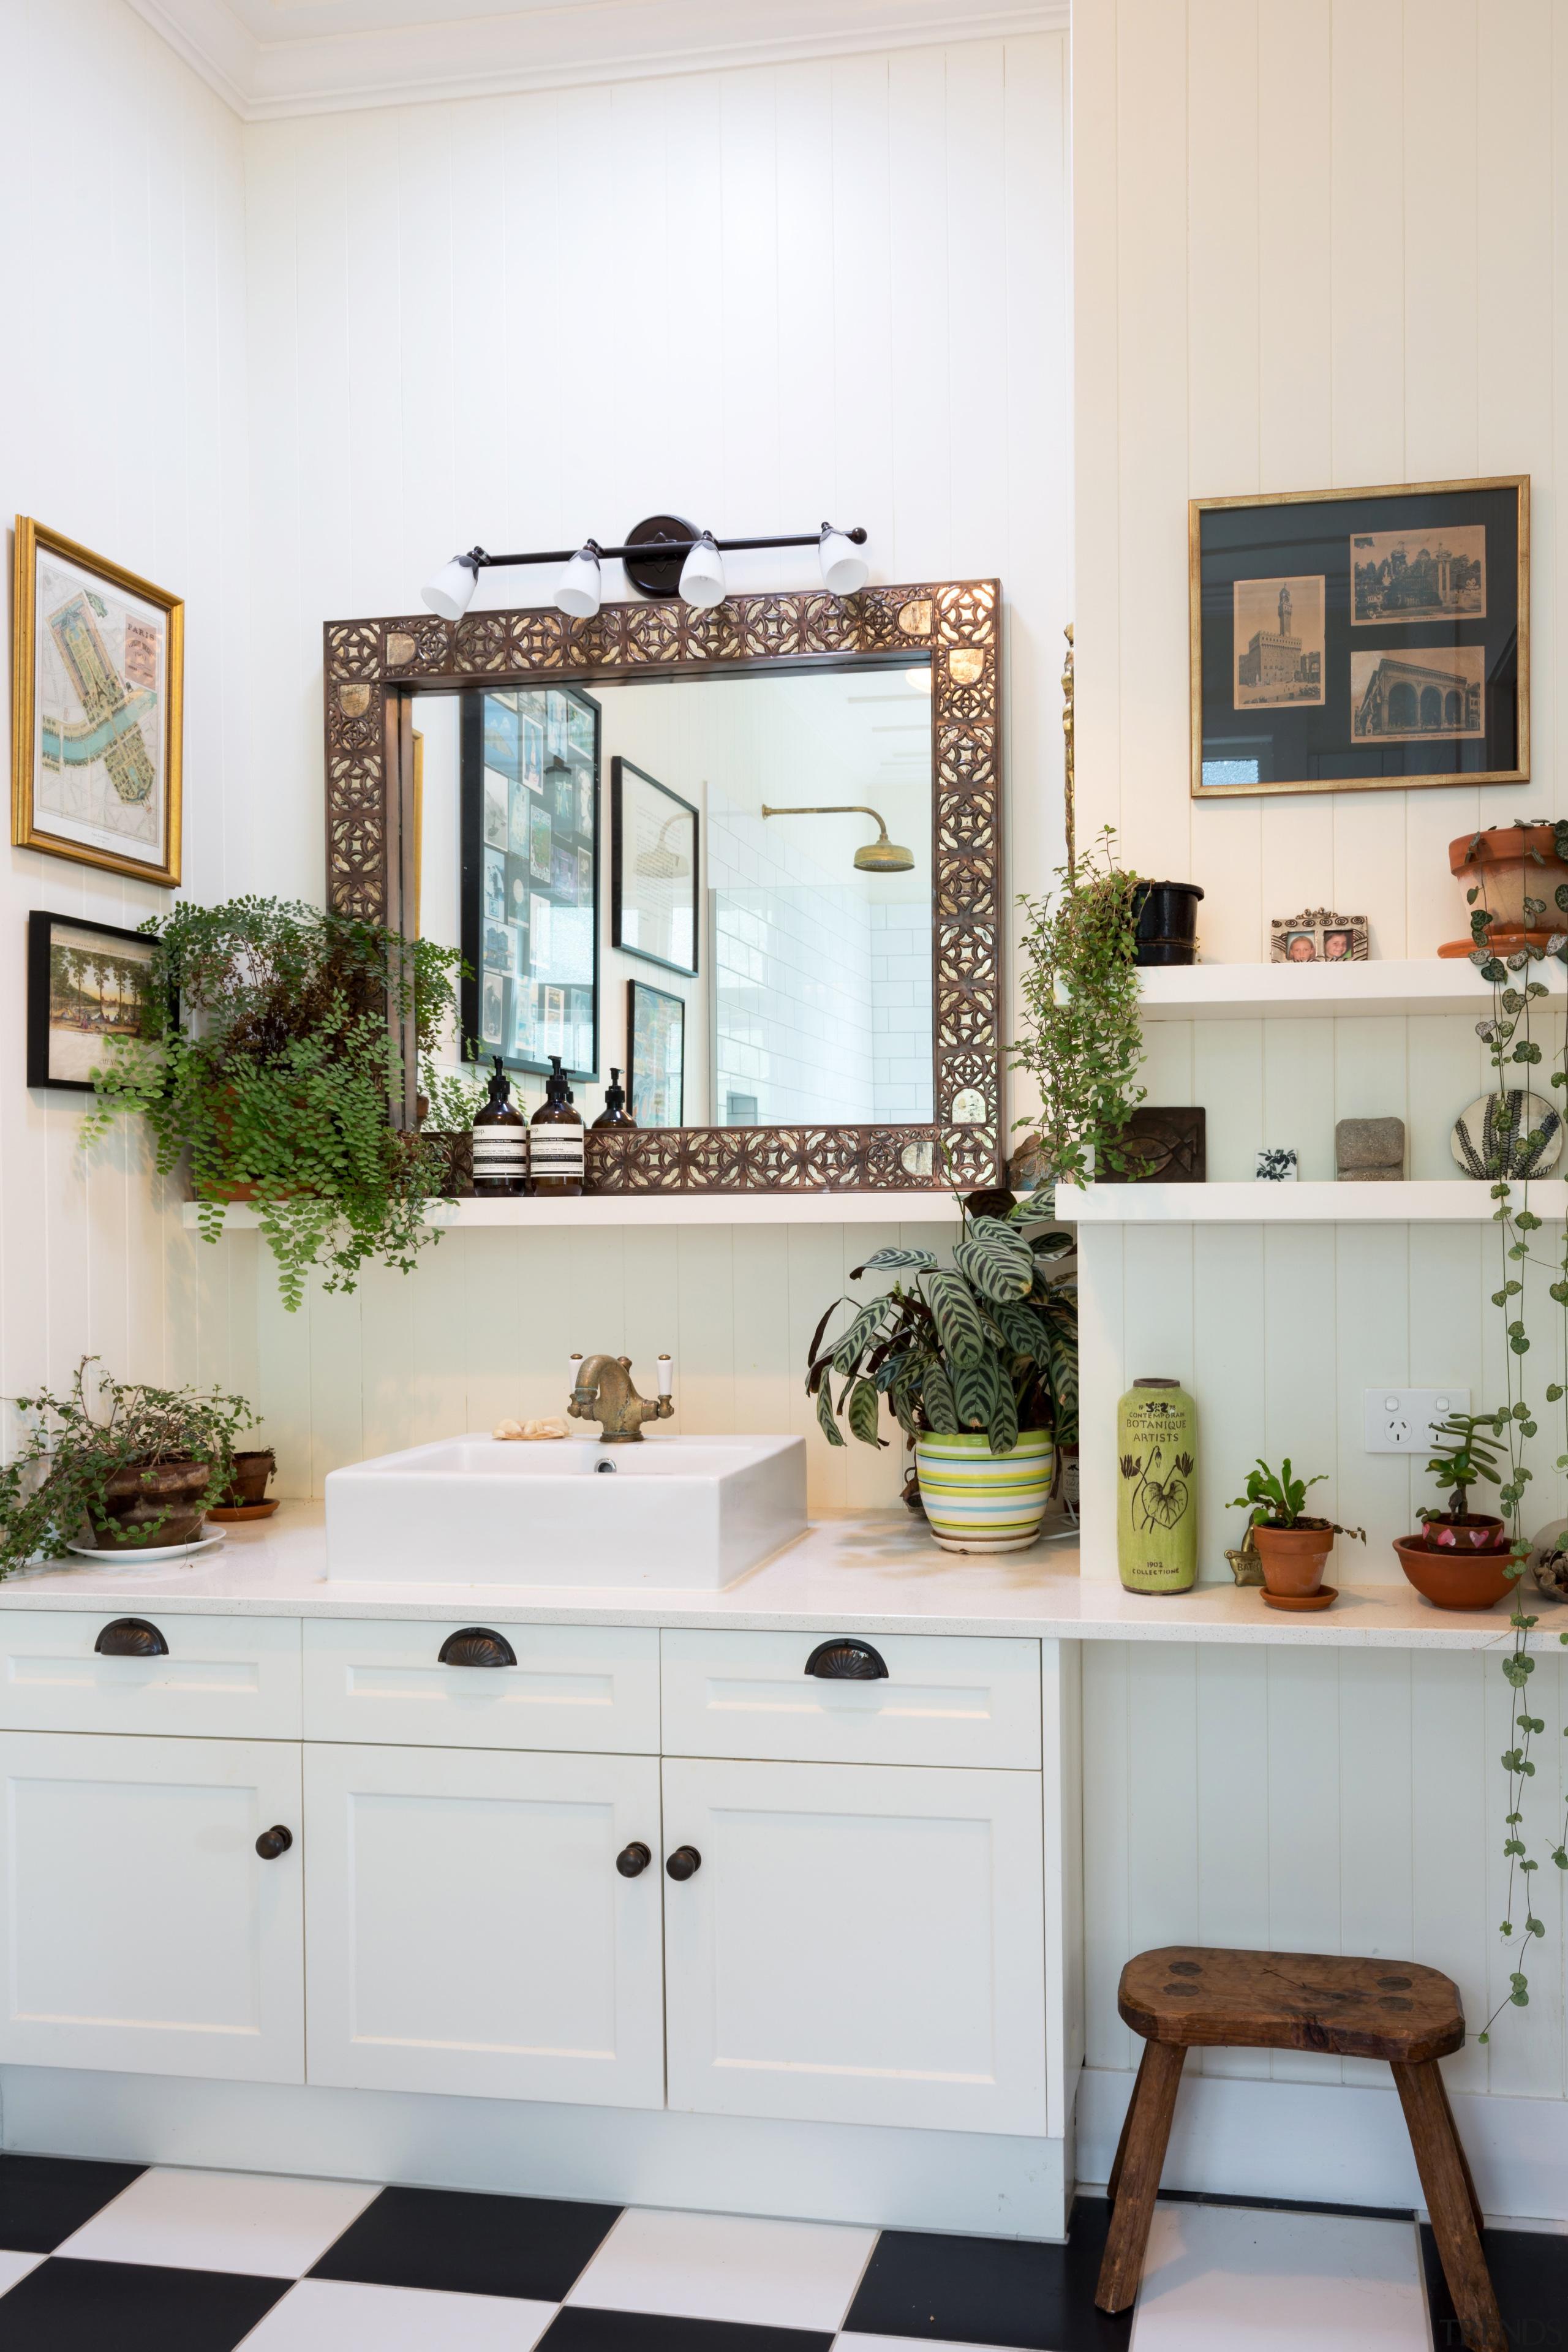 Ample dedicated niche and shelf storage is worked bathroom, furniture, home, interior design, room, sink, window, white